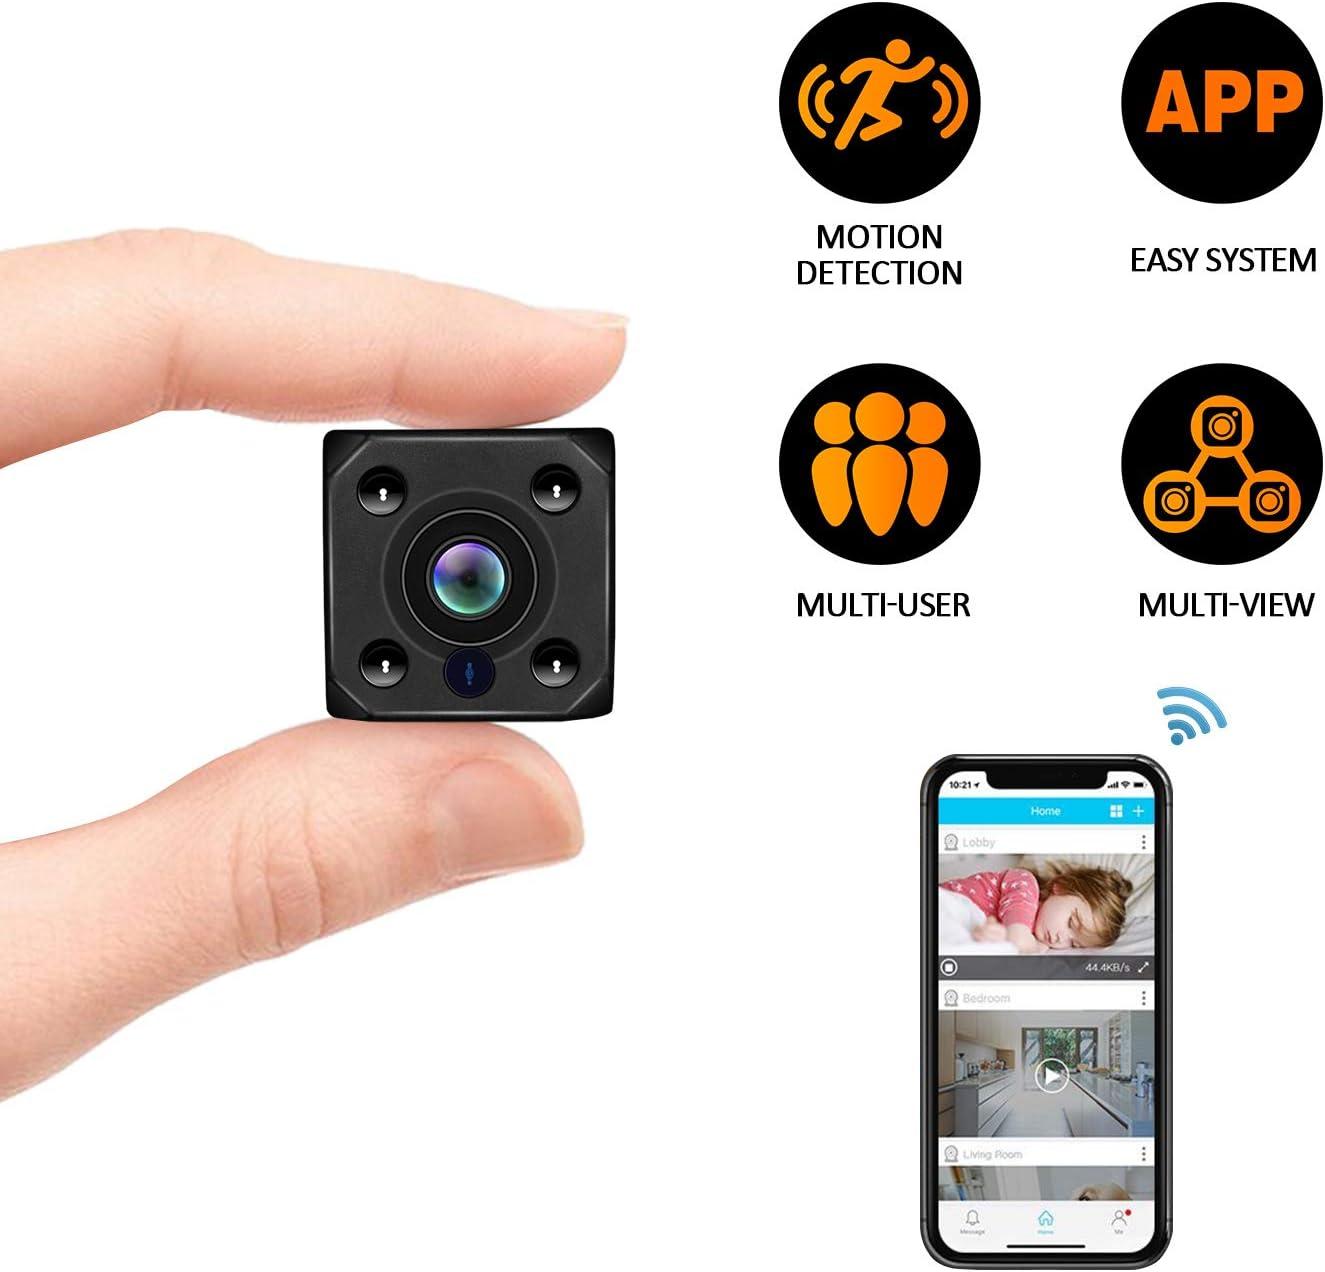 Mini Spy Hidden Camera, Wireless Hidden Camera Portable Dice HD1080P Video USB DVR Recording